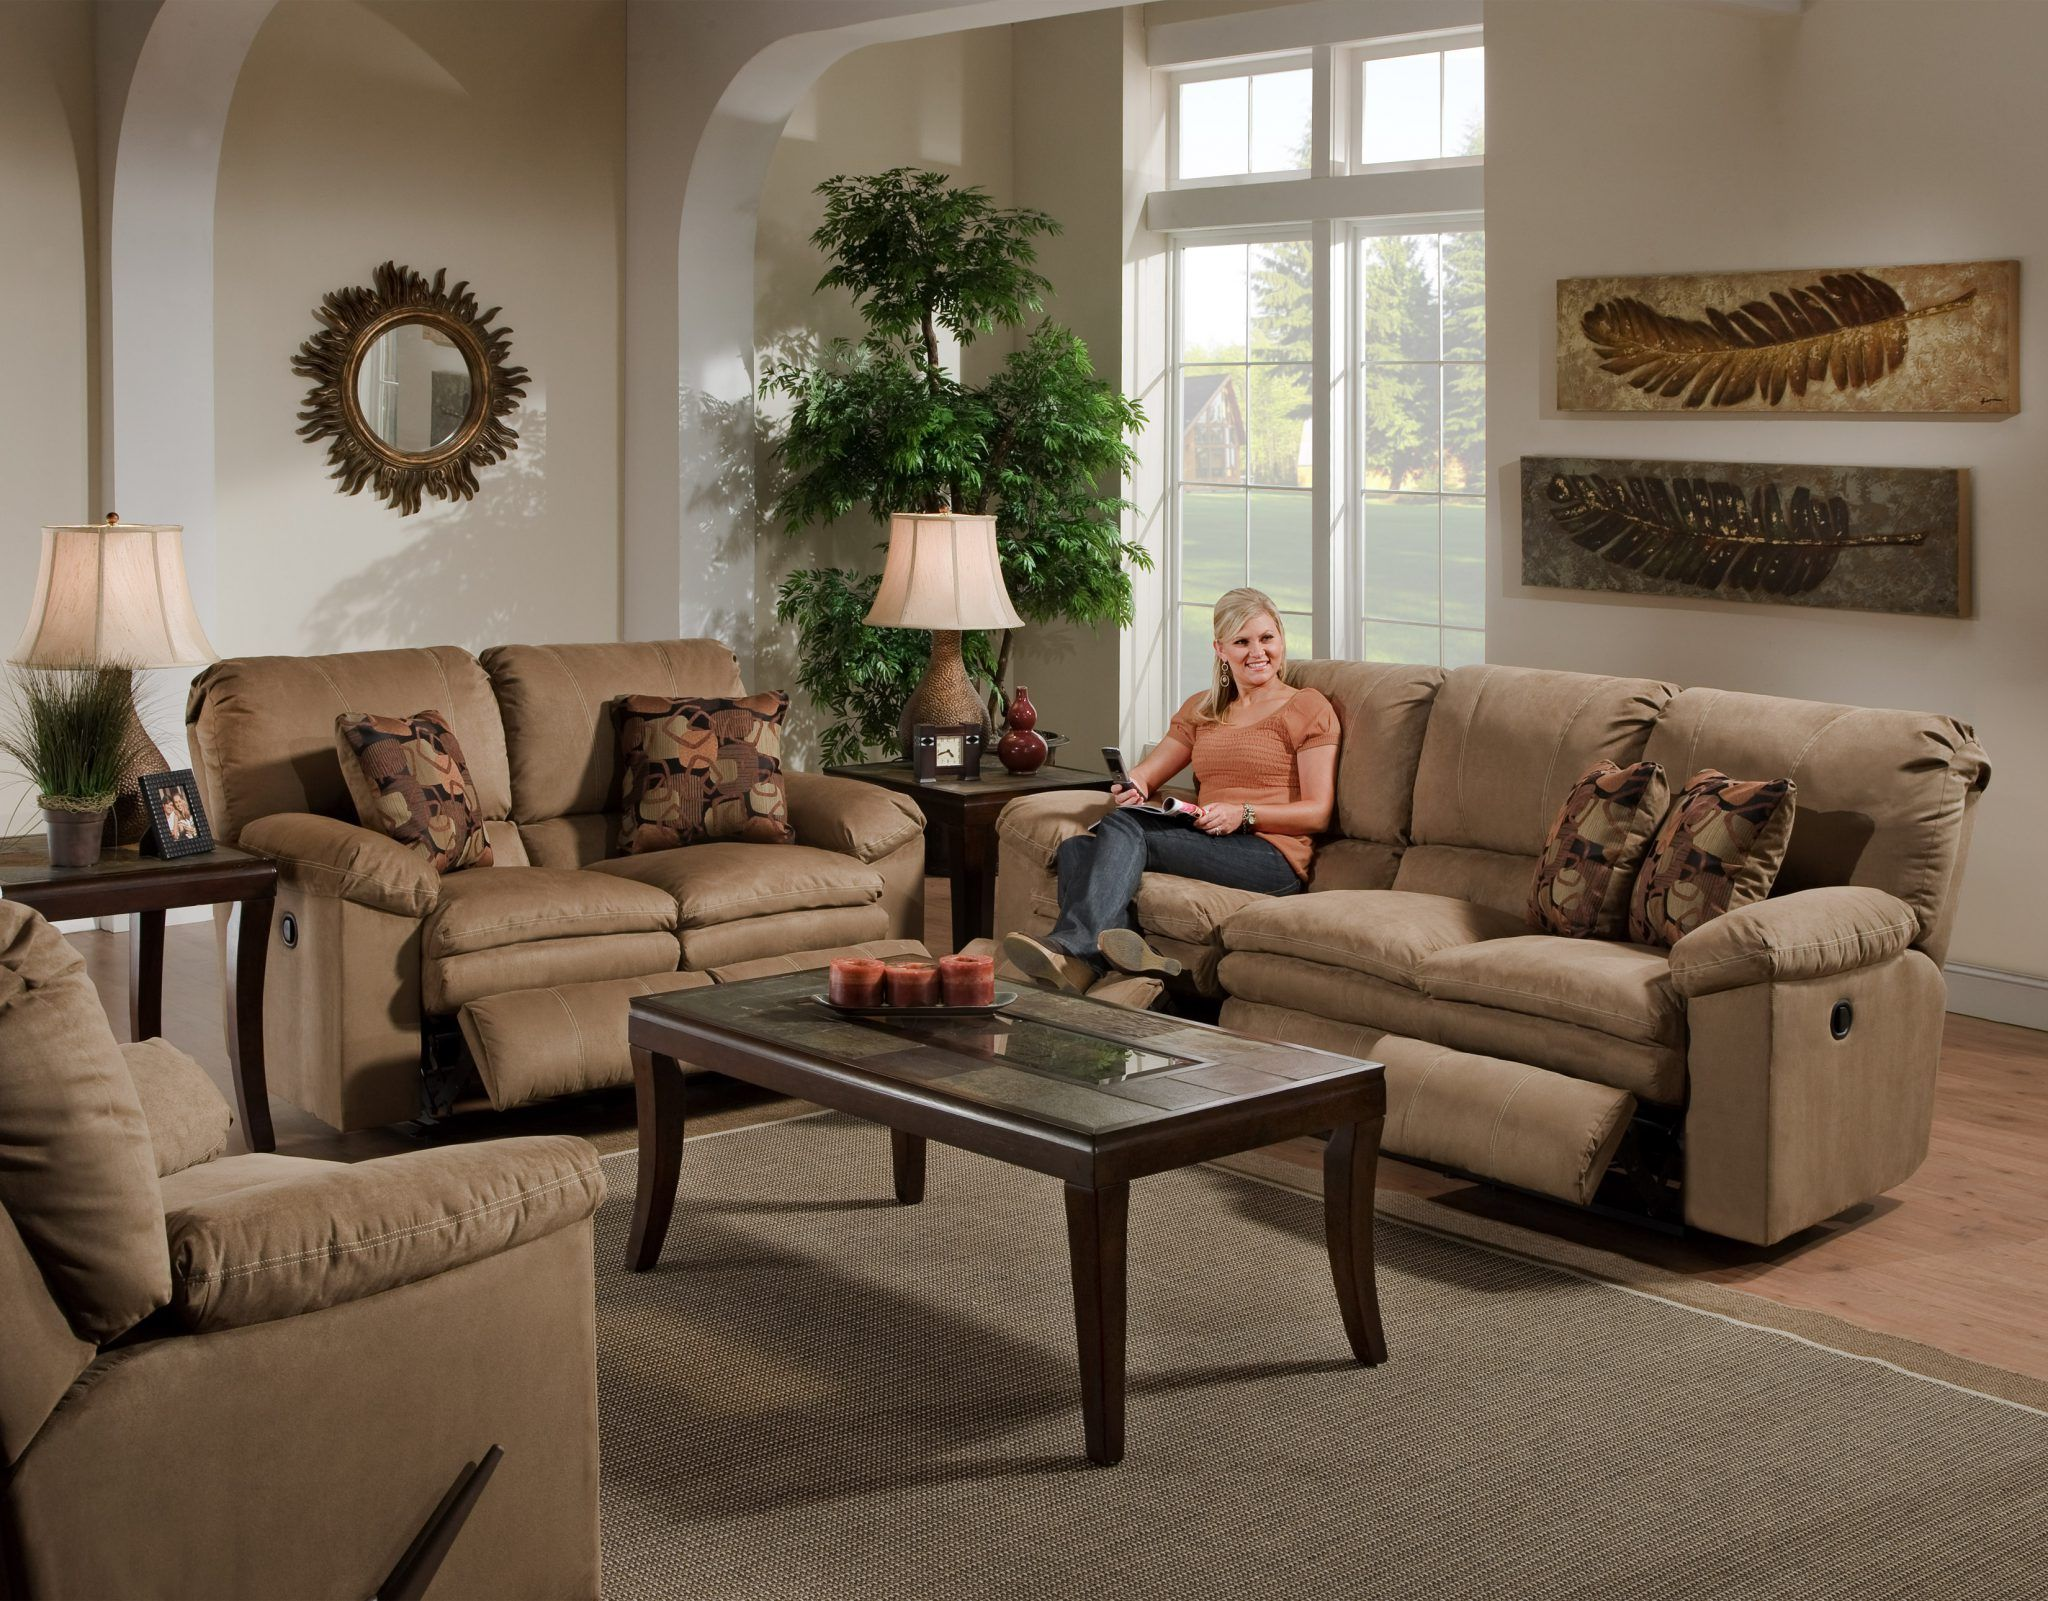 #Wohnzimmer 20 Besten Klassischen Country Living Room Decor #20 #Besten